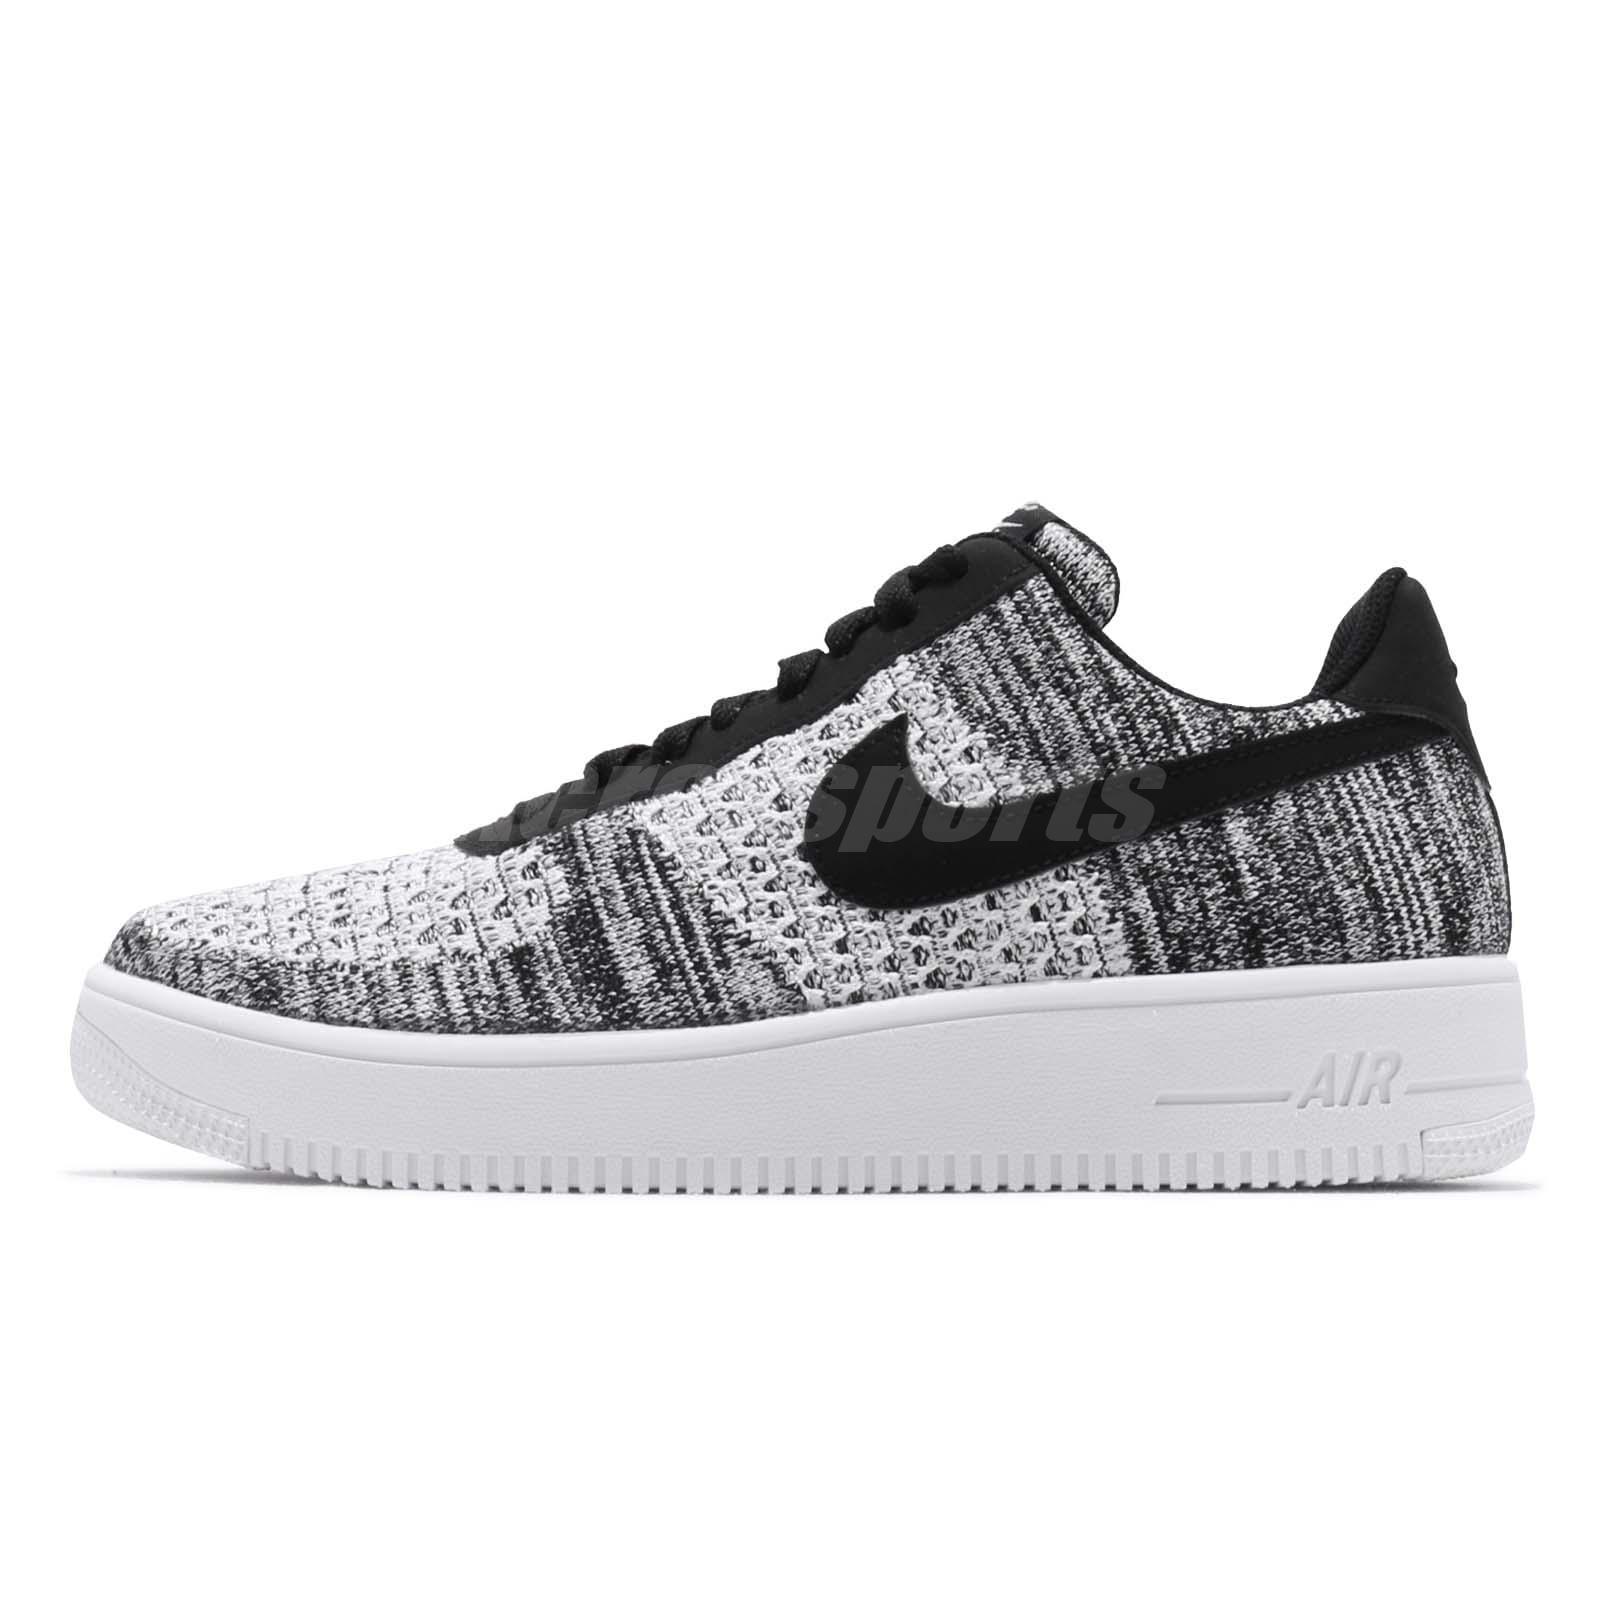 56c6d722 Nike Air Force 1 Flyknit 2.0 Black White Men Casual Shoes AF1 Sneaker  AV3042-001